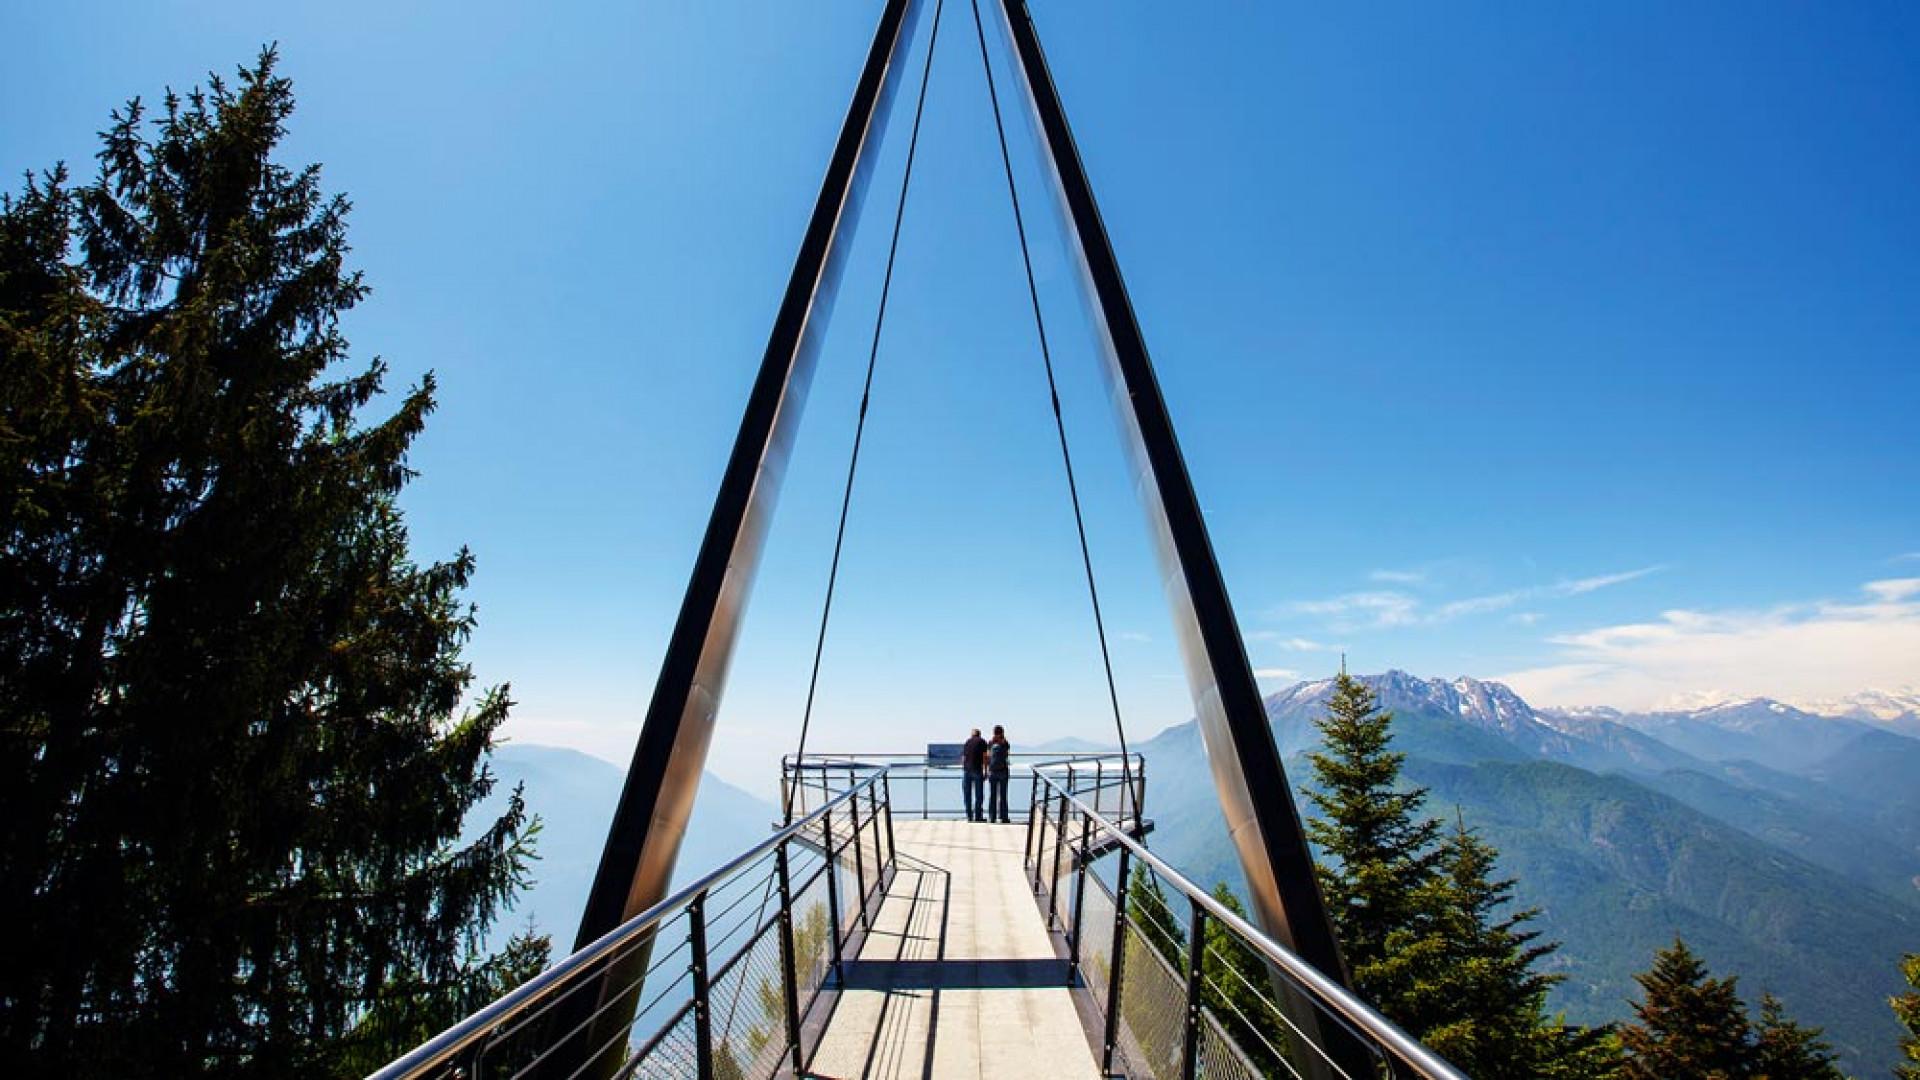 Viewpoint near Ascona, Lake Maggiore, Switzerland